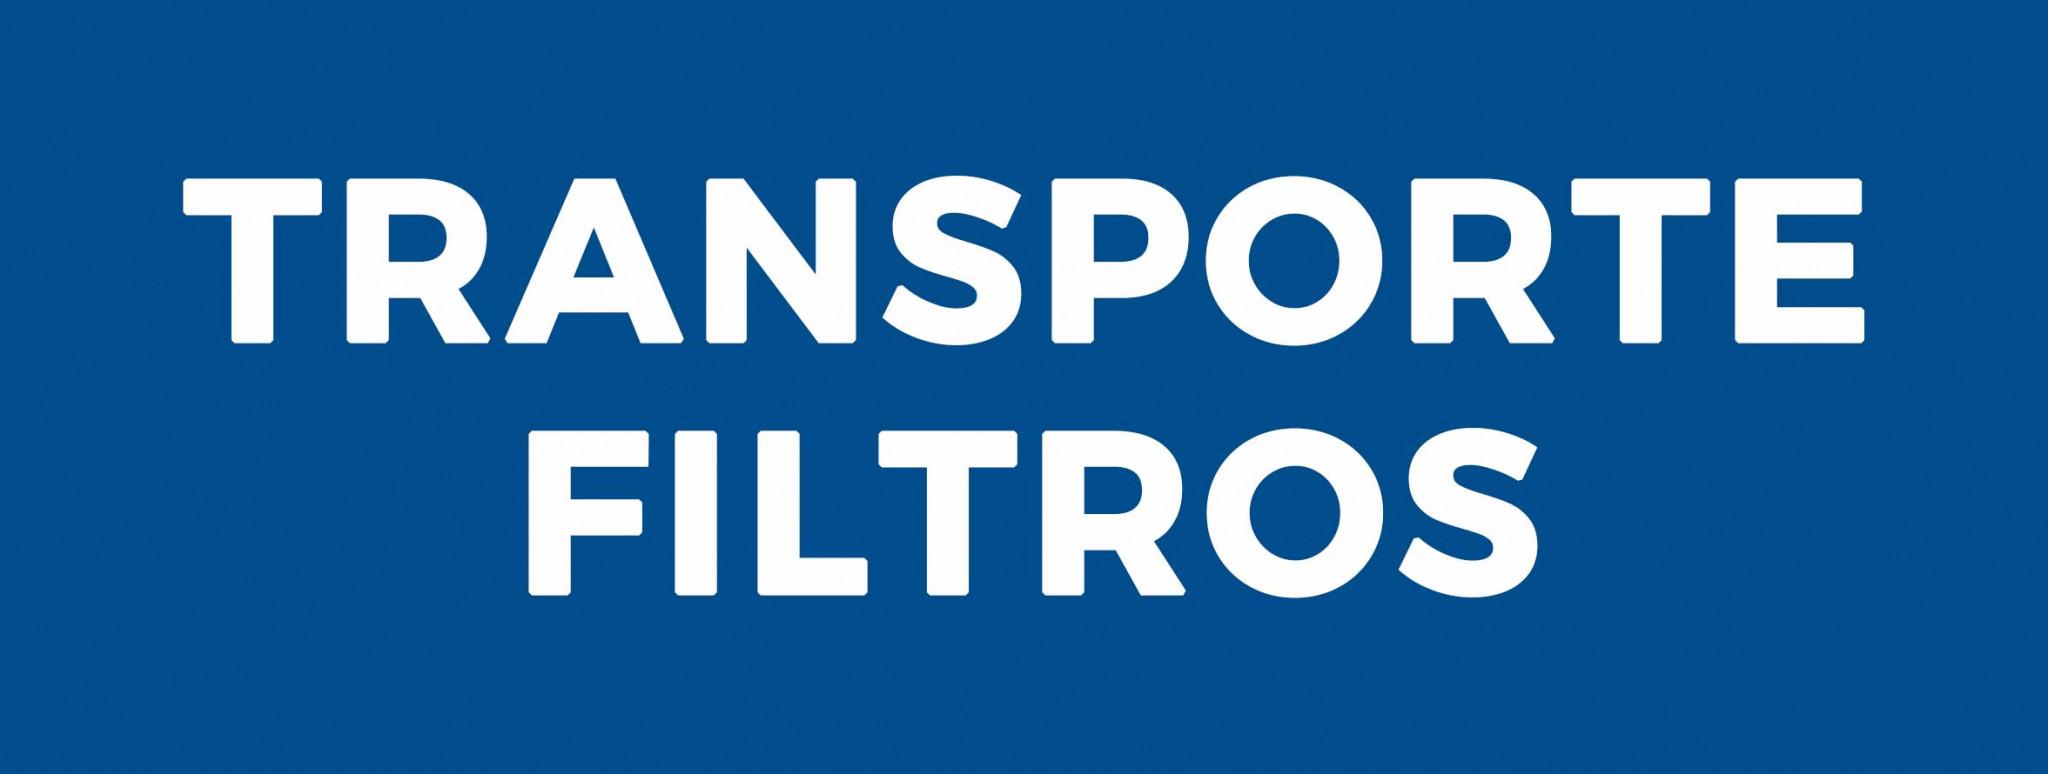 Transporte Filtros